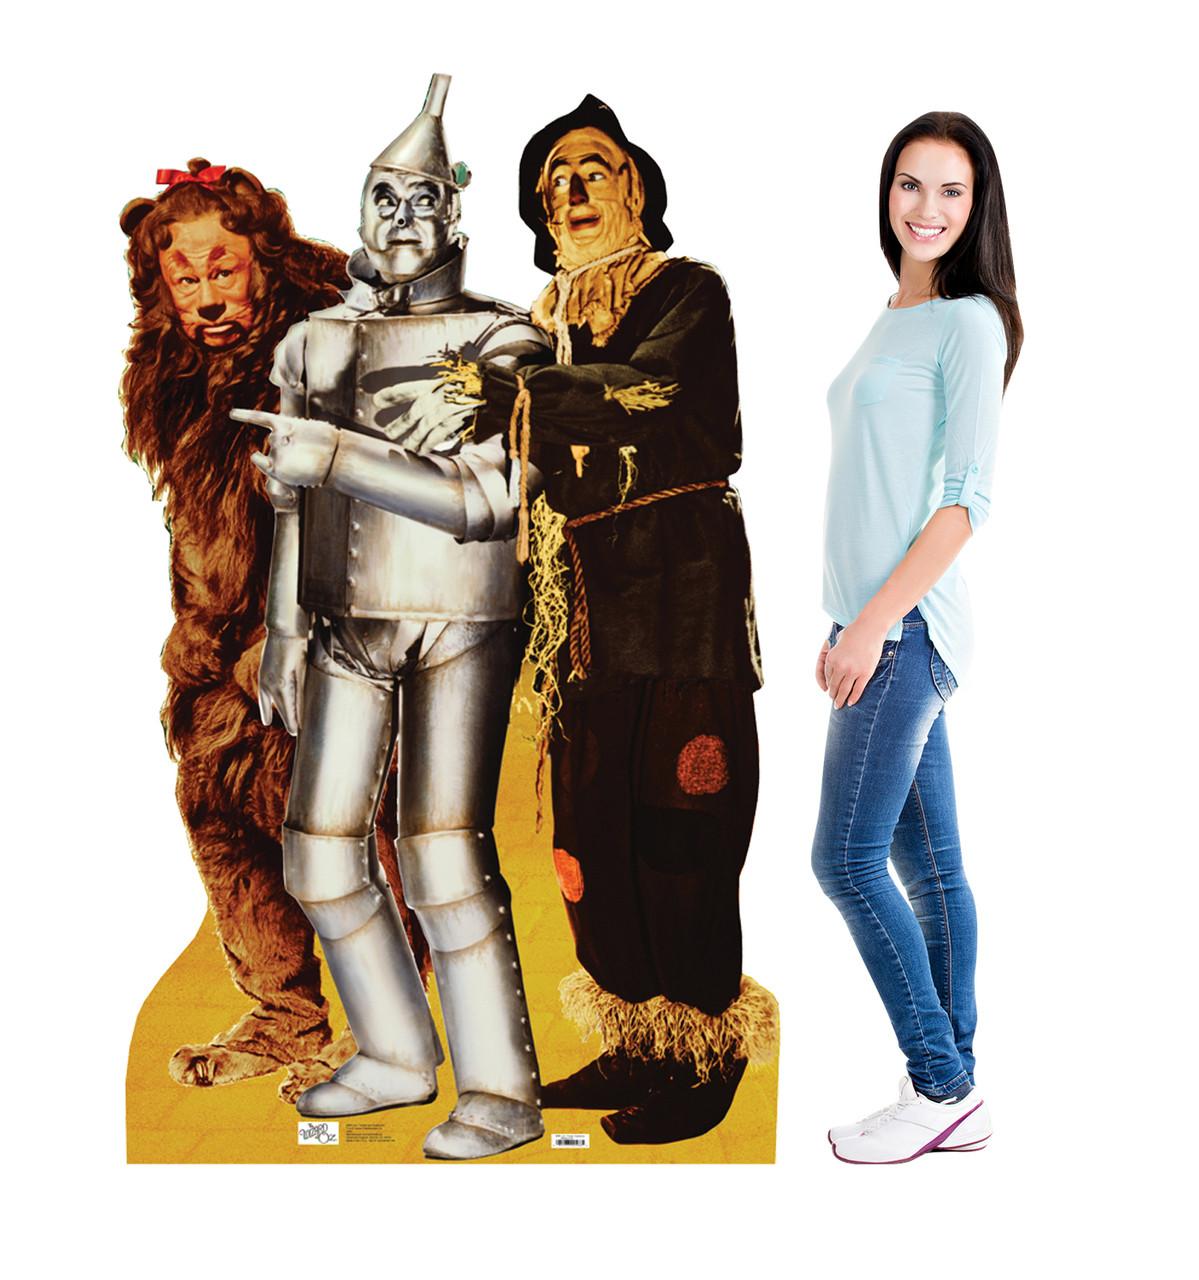 Life-size Lion, Tin Man, and Scarecrow Cardboard Standup